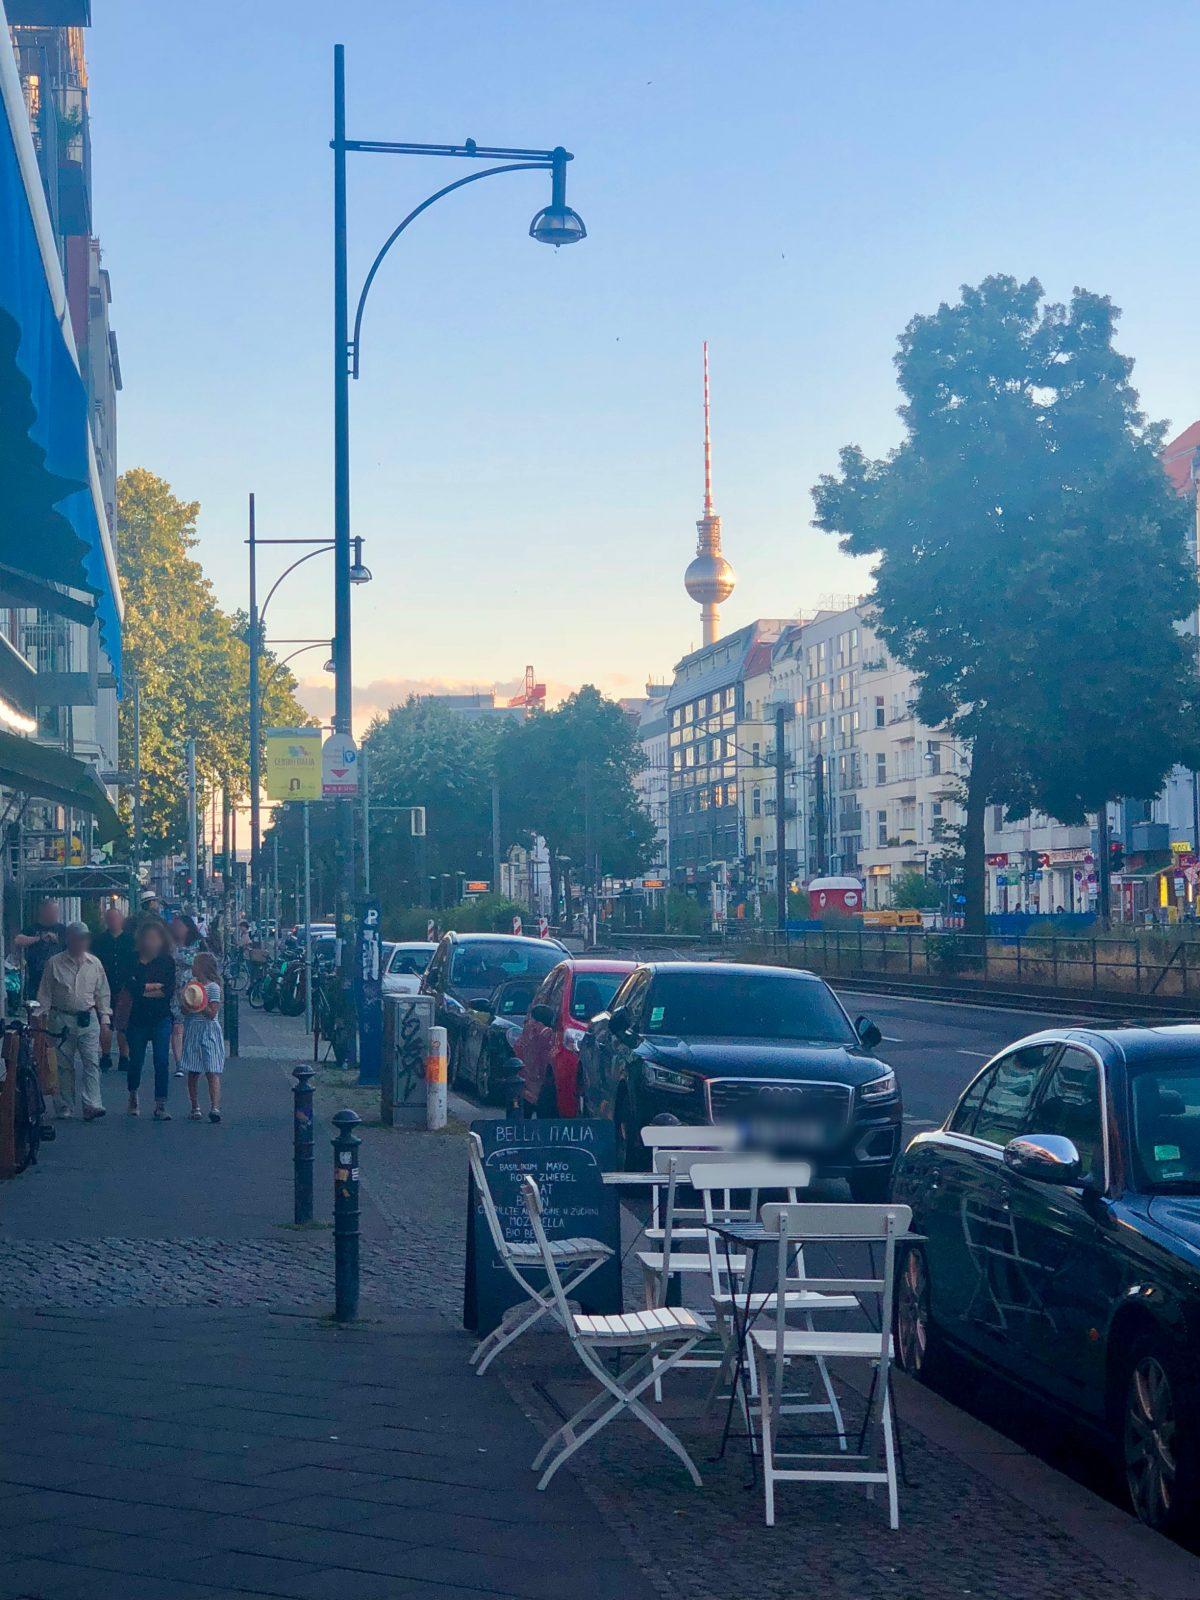 Greifswalder Straße | berlinmittemom.com